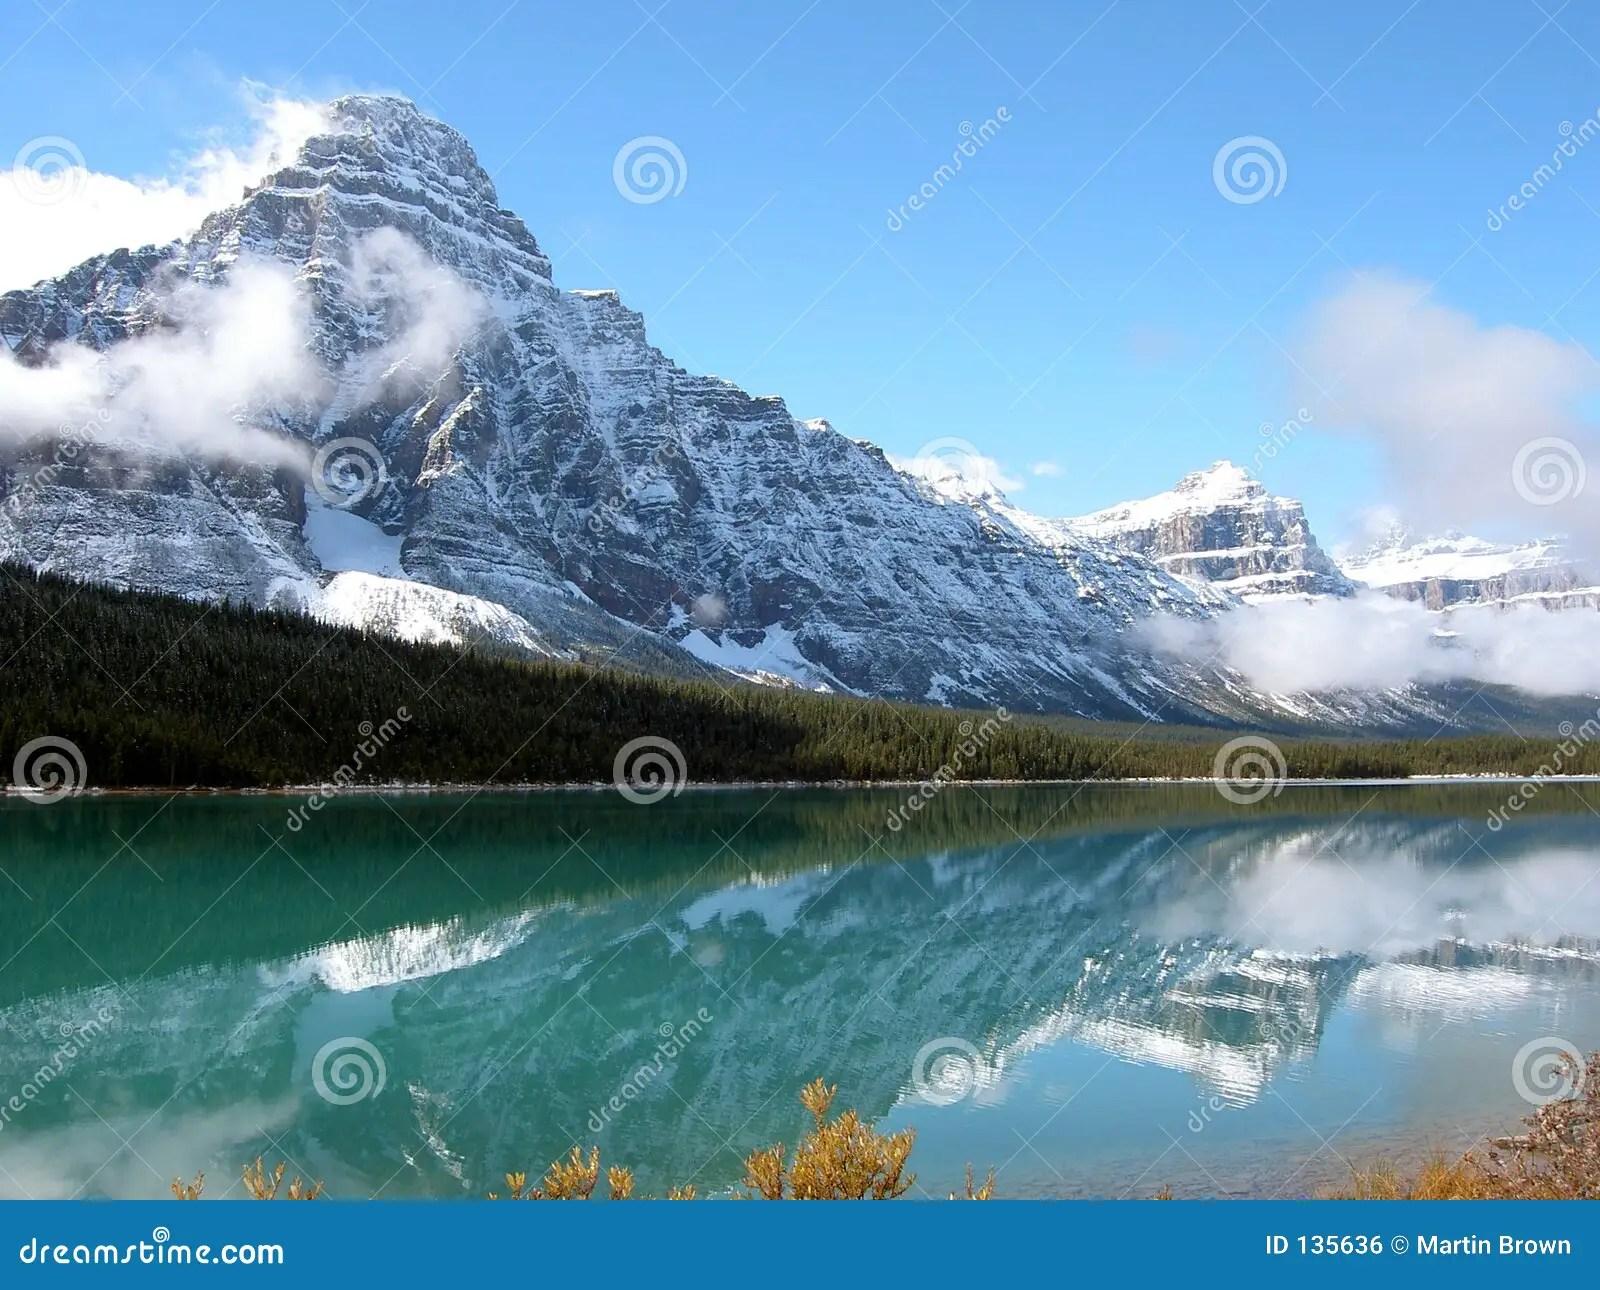 rocky mountains rocky mountains